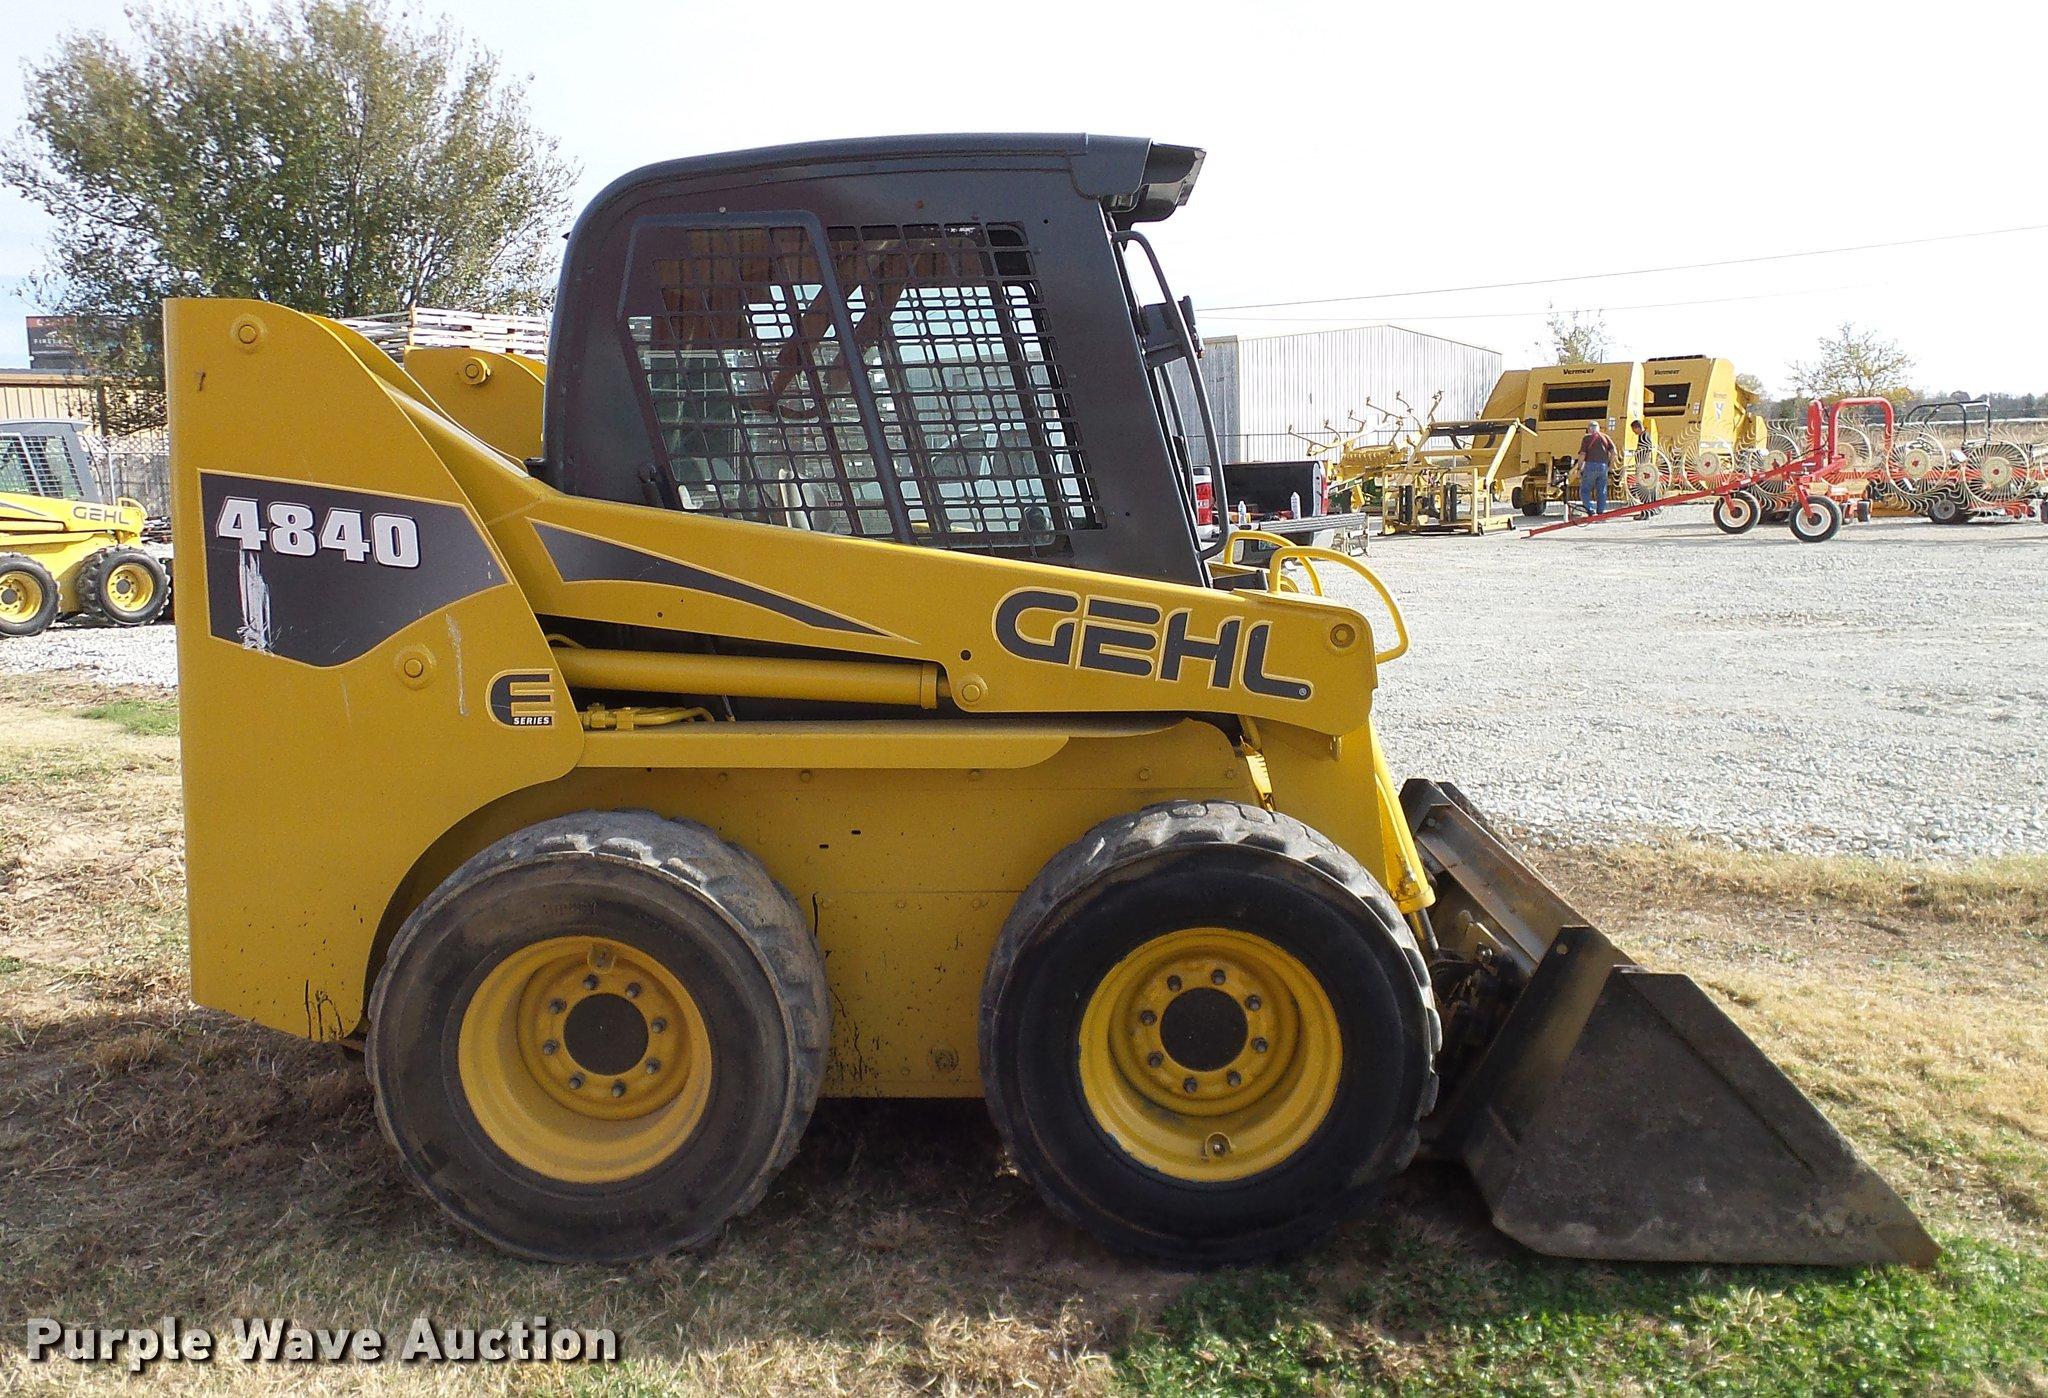 ... Gehl 4840E skid steer Full size in new window ...